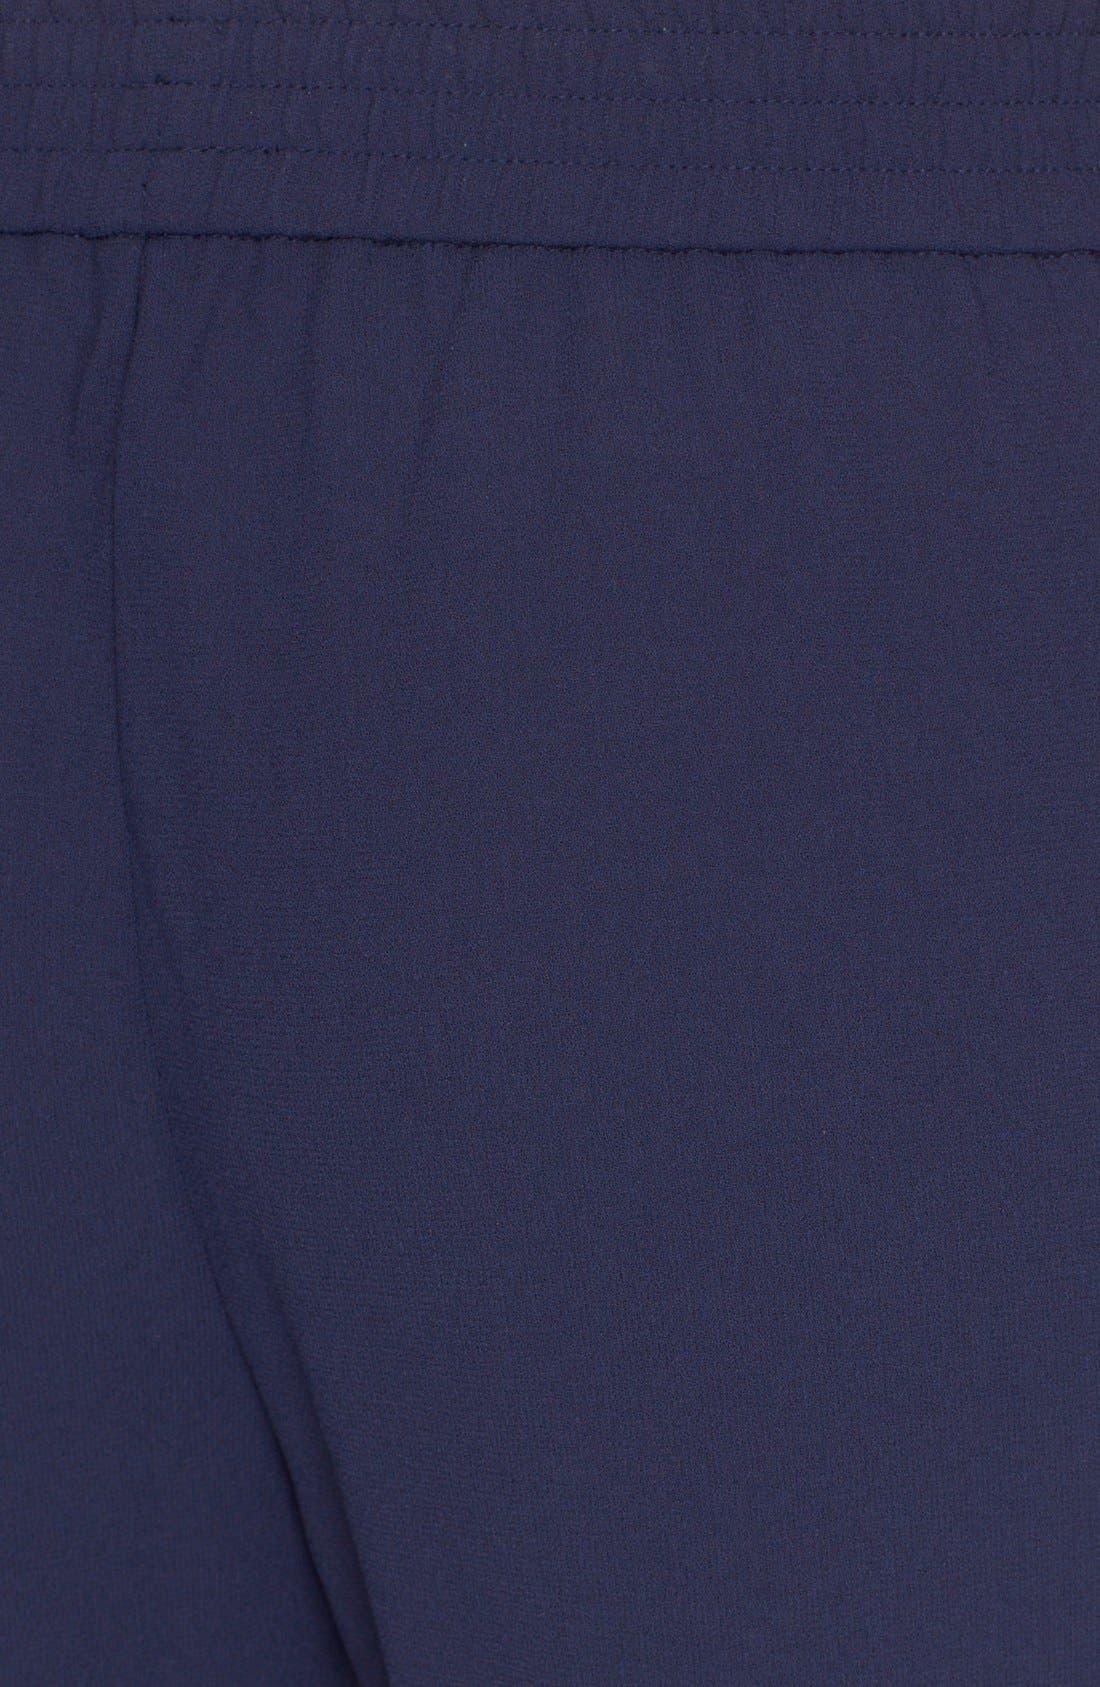 'Mariner B.' Track Pants,                             Alternate thumbnail 4, color,                             418